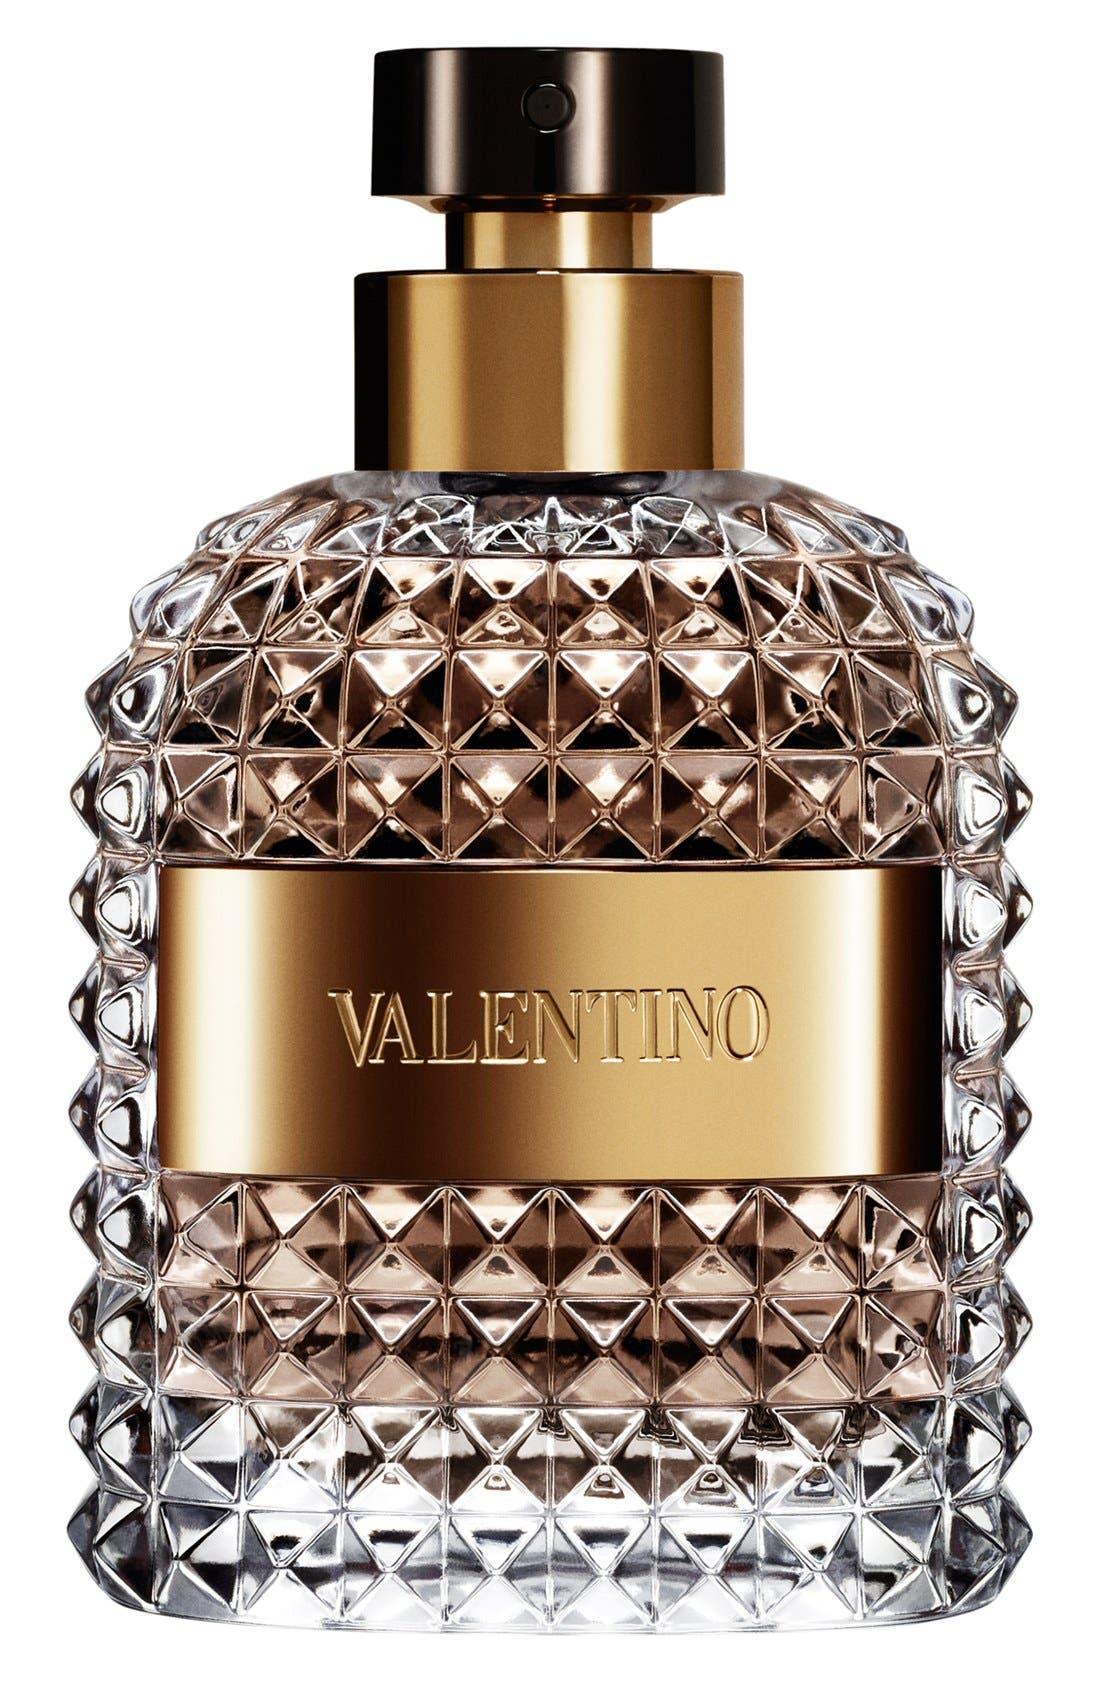 VALENTINO, Uomo Fragrance, Main thumbnail 1, color, 000